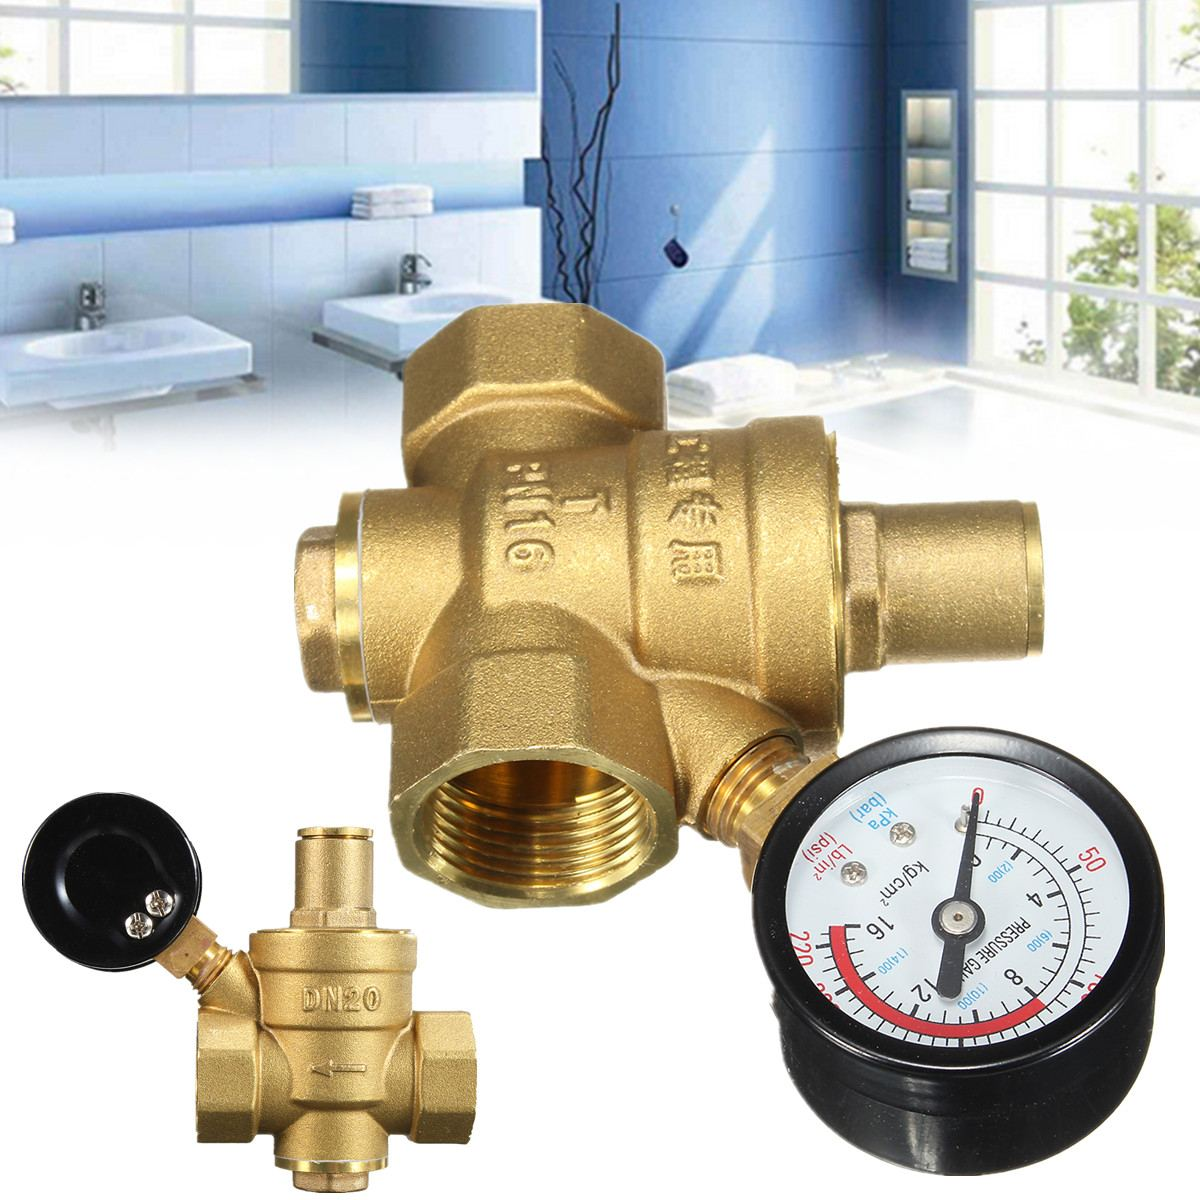 Water-Pressure-Regulator Gauge-Meter Reducer Dn20-Npt Adjustable Brass Hydraulic-Instability/water-Purifier